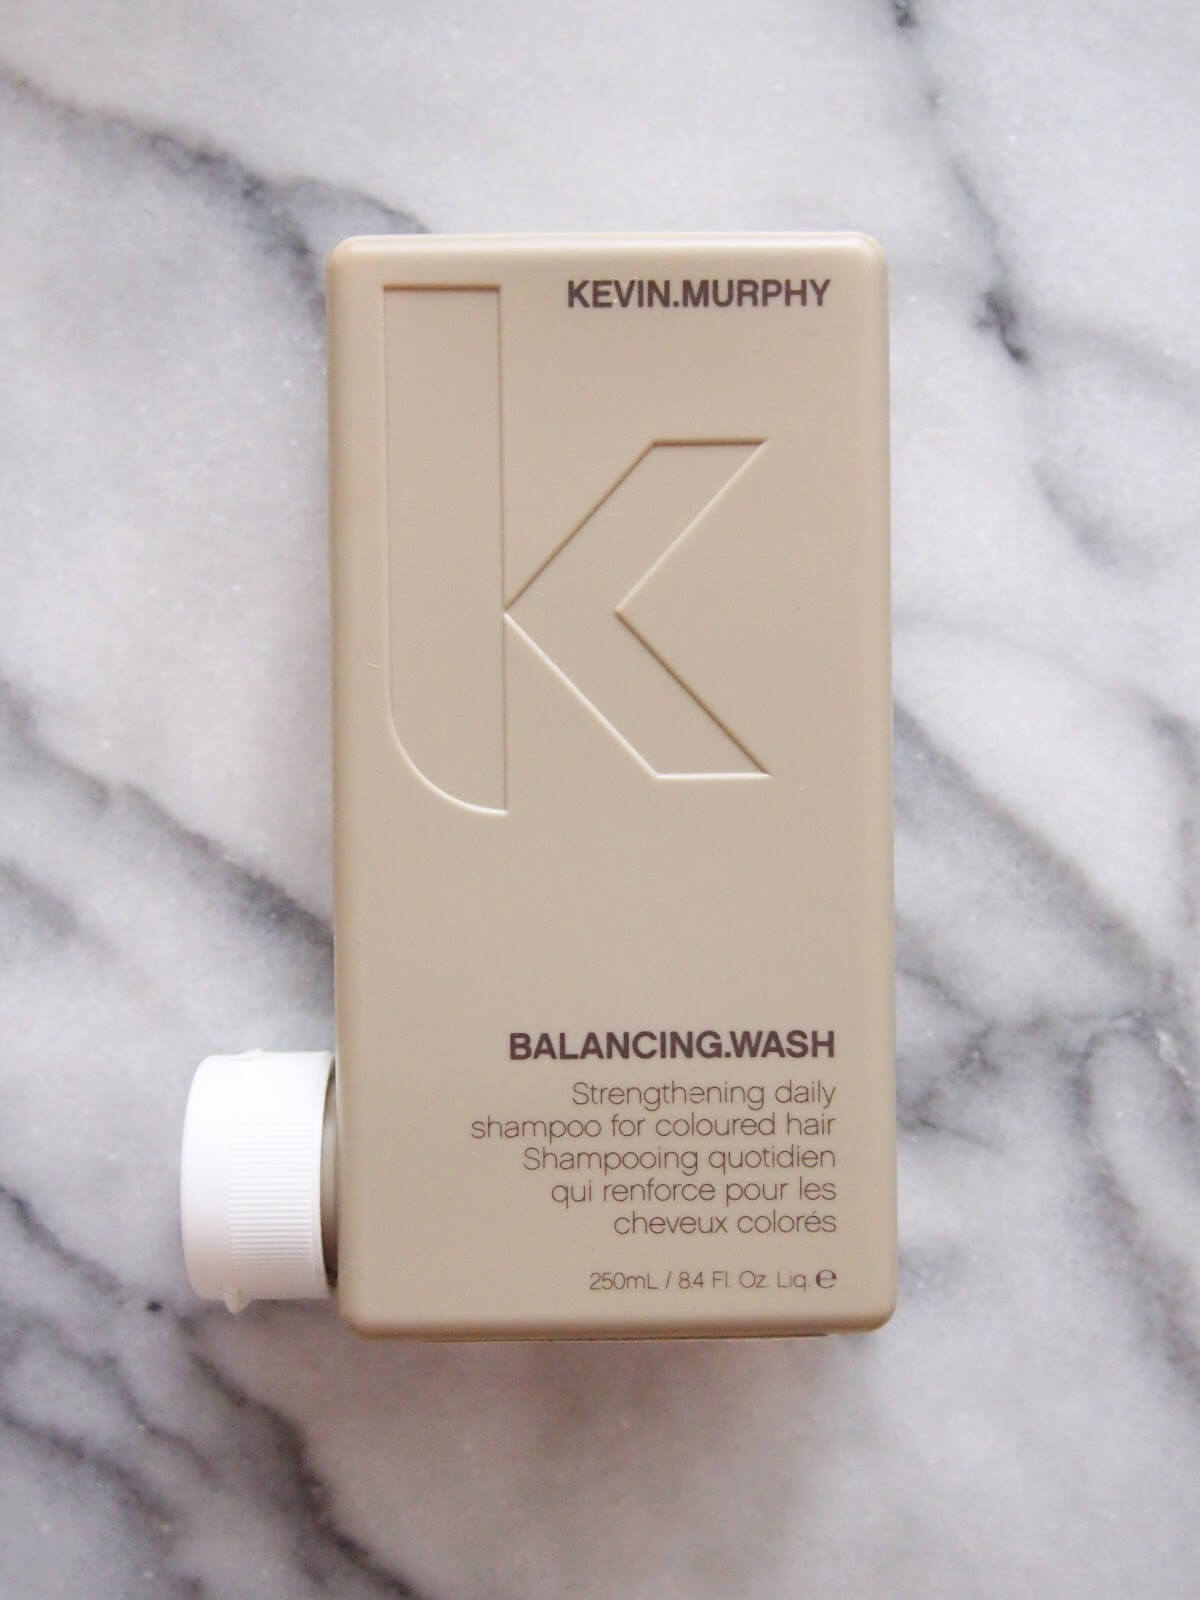 kevin murphy balancing wash shampoo